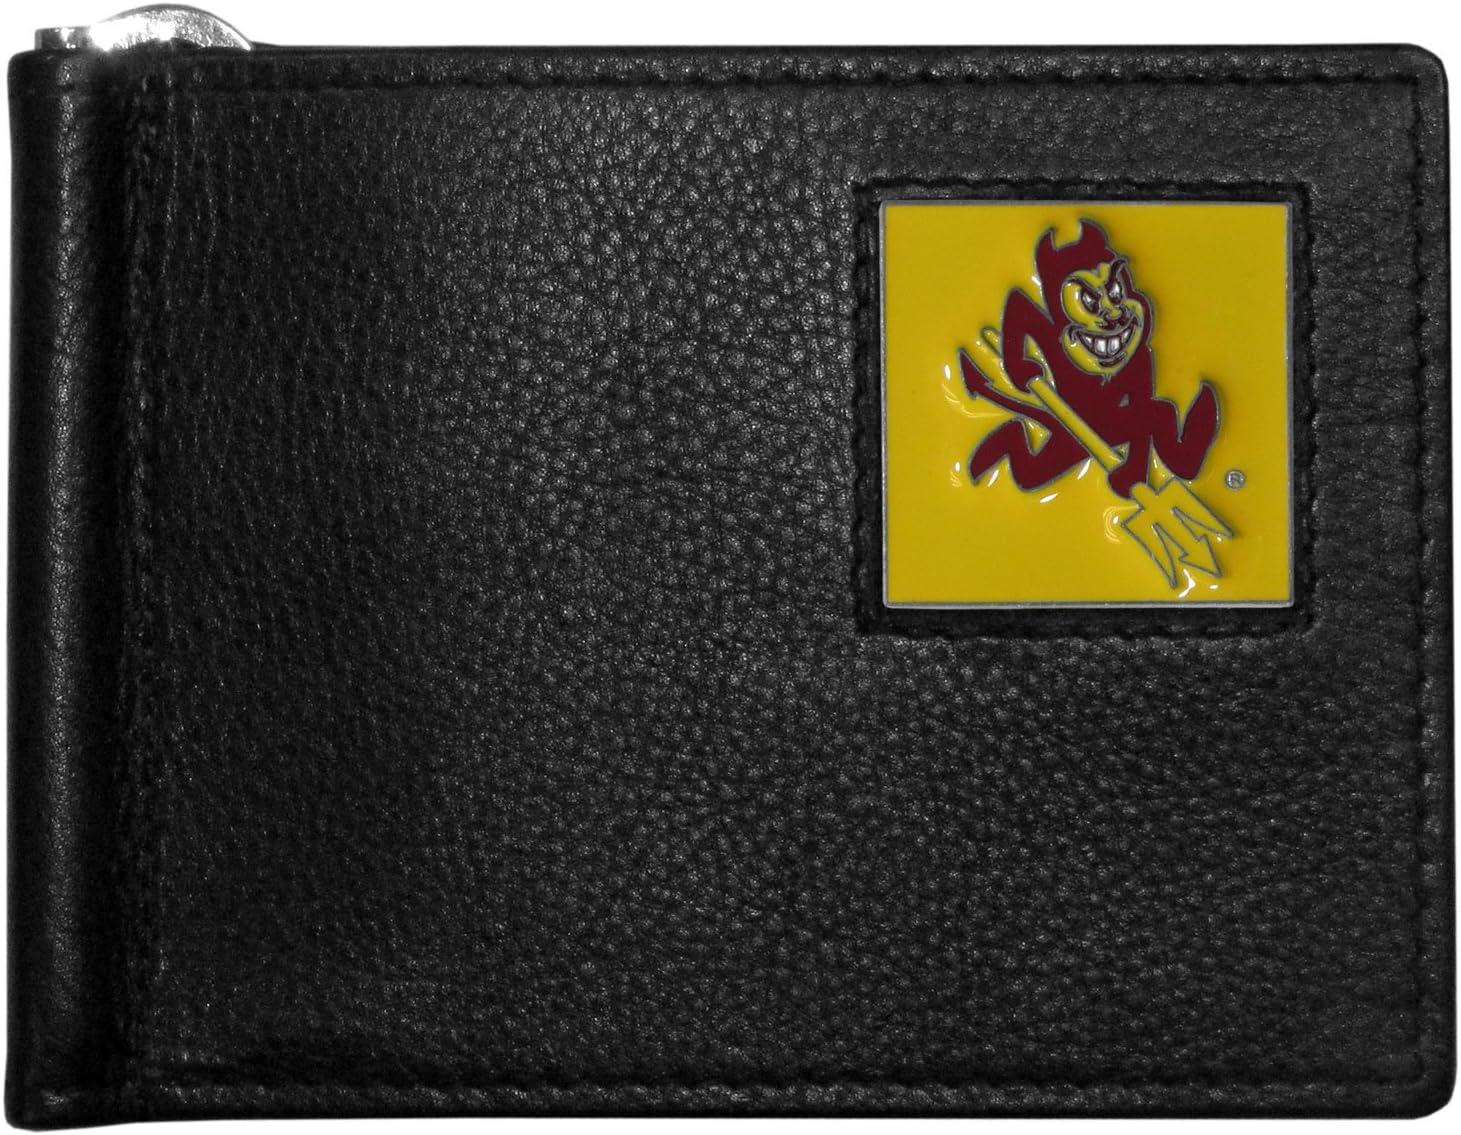 Siskiyou NCAA Leather Bill Clip Wallet